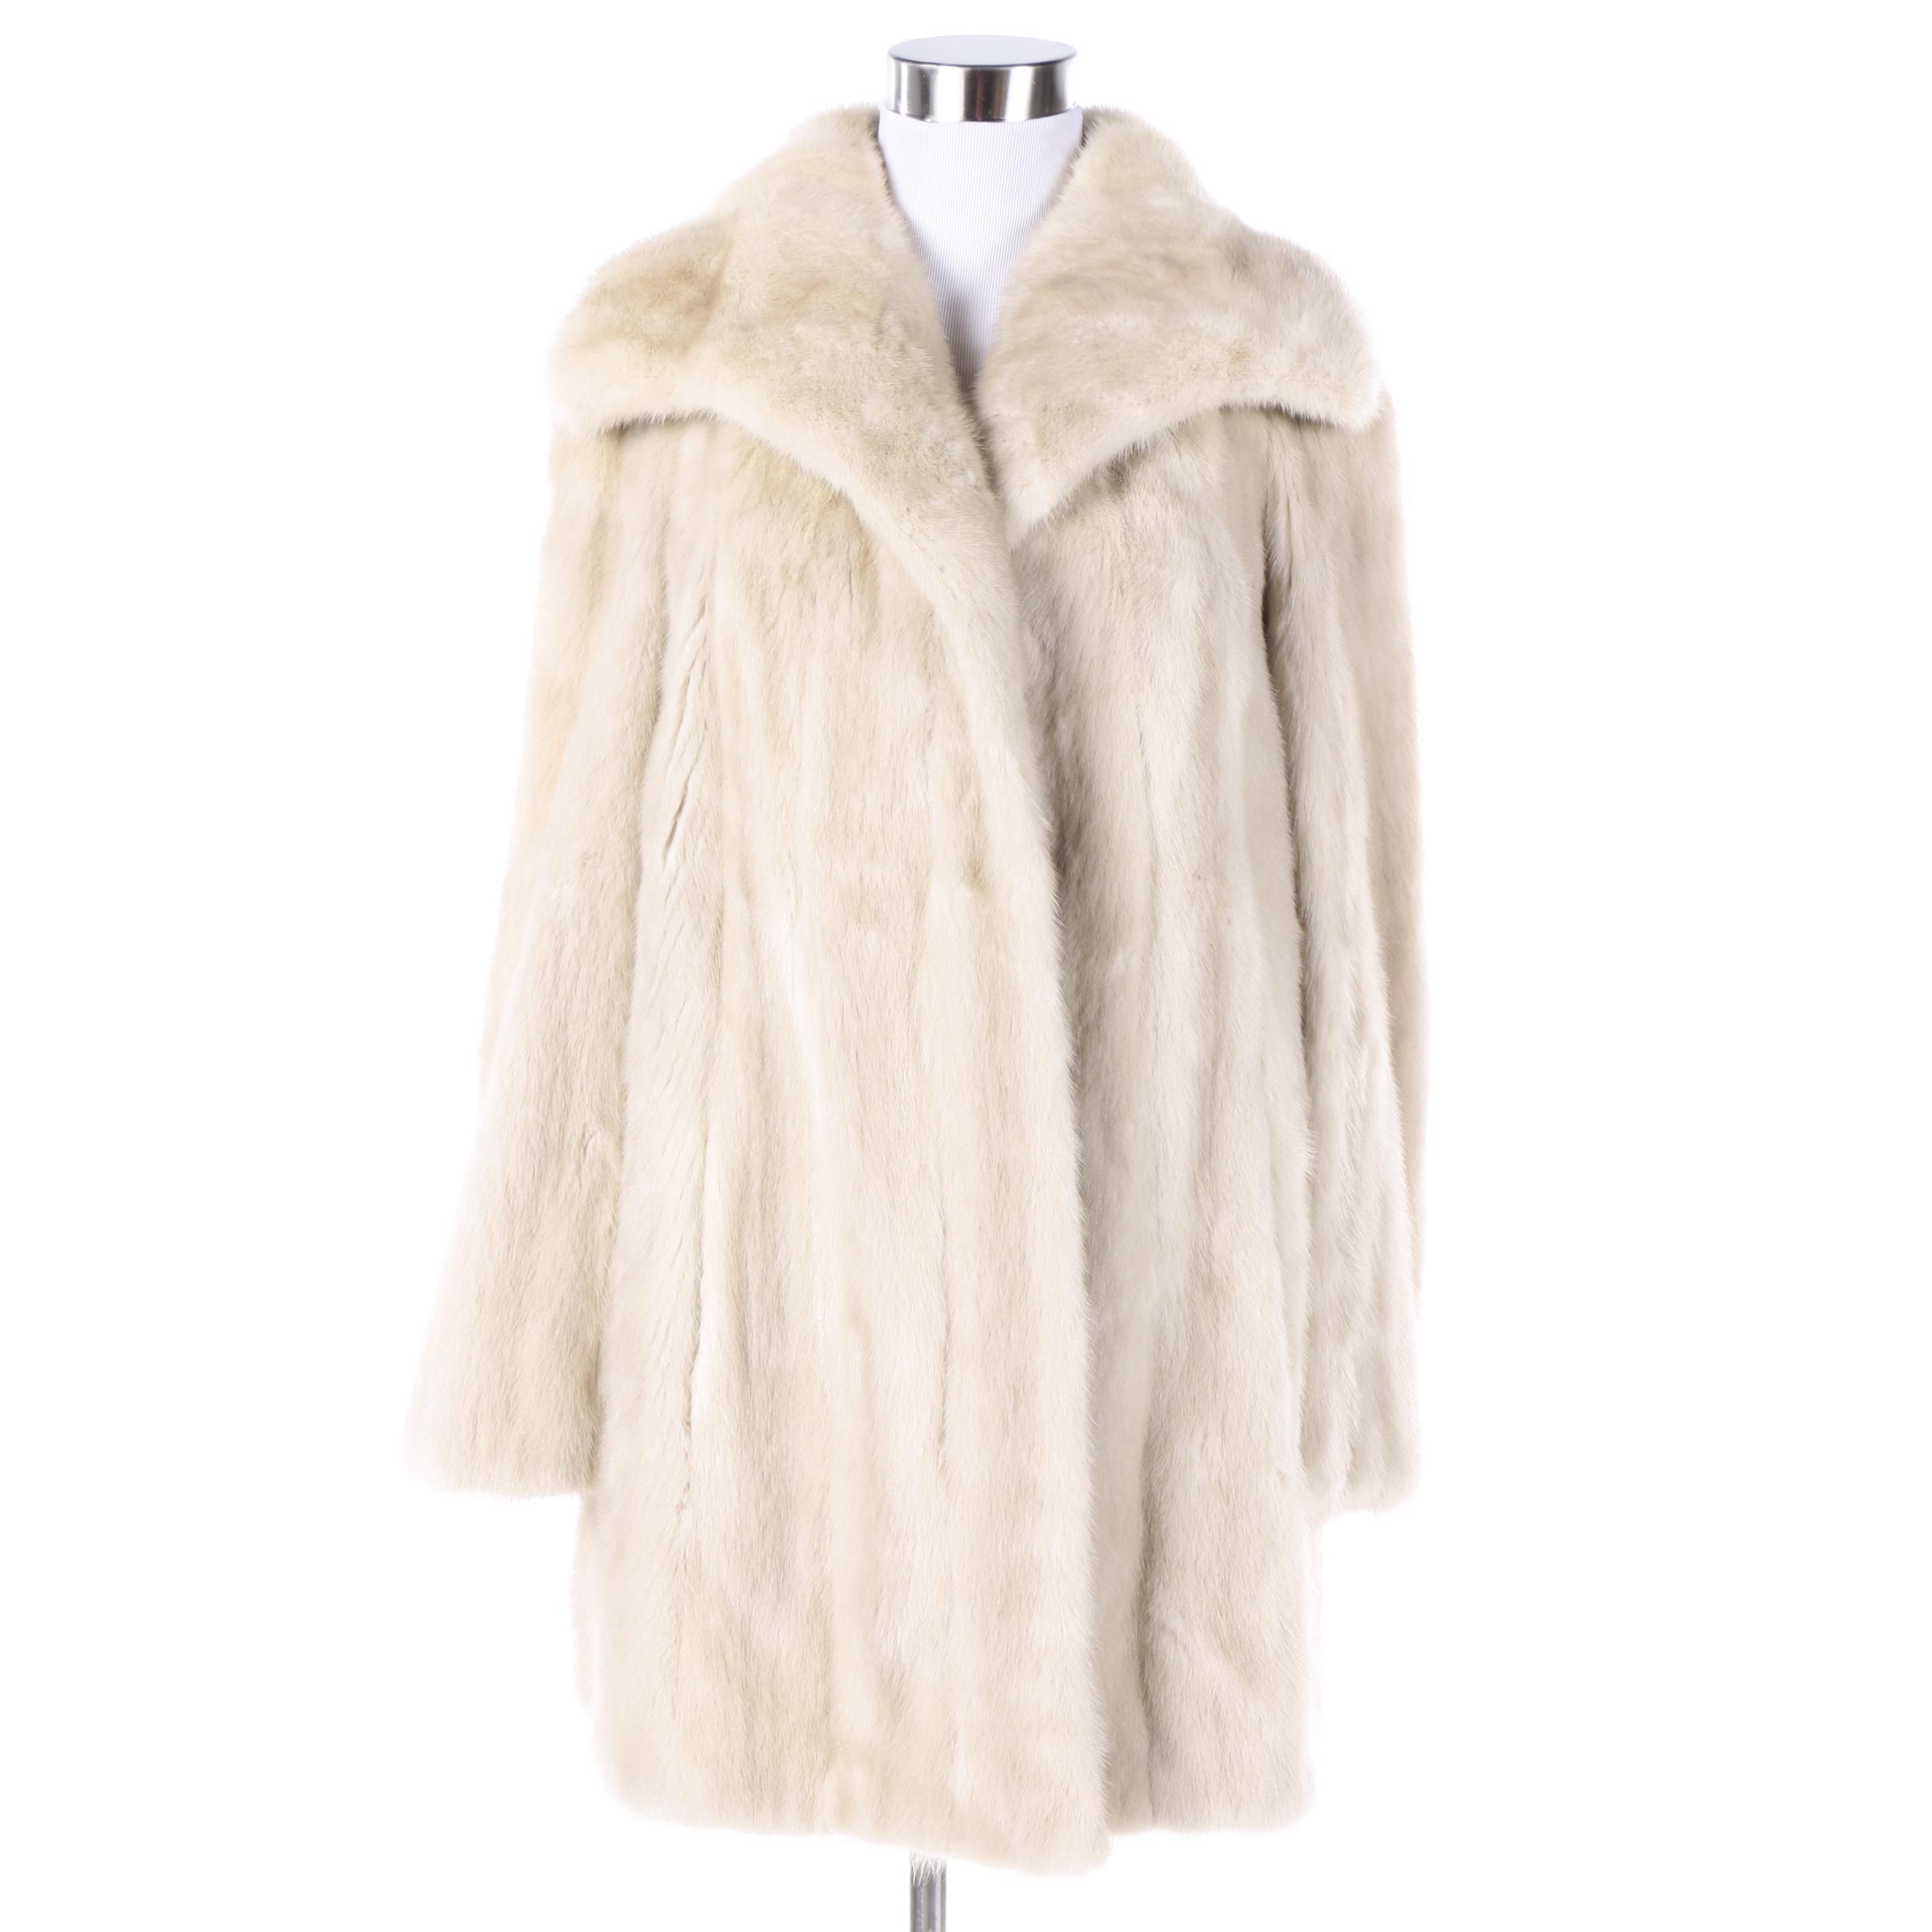 Vintage Ronley Platinum Mink Fur Coat